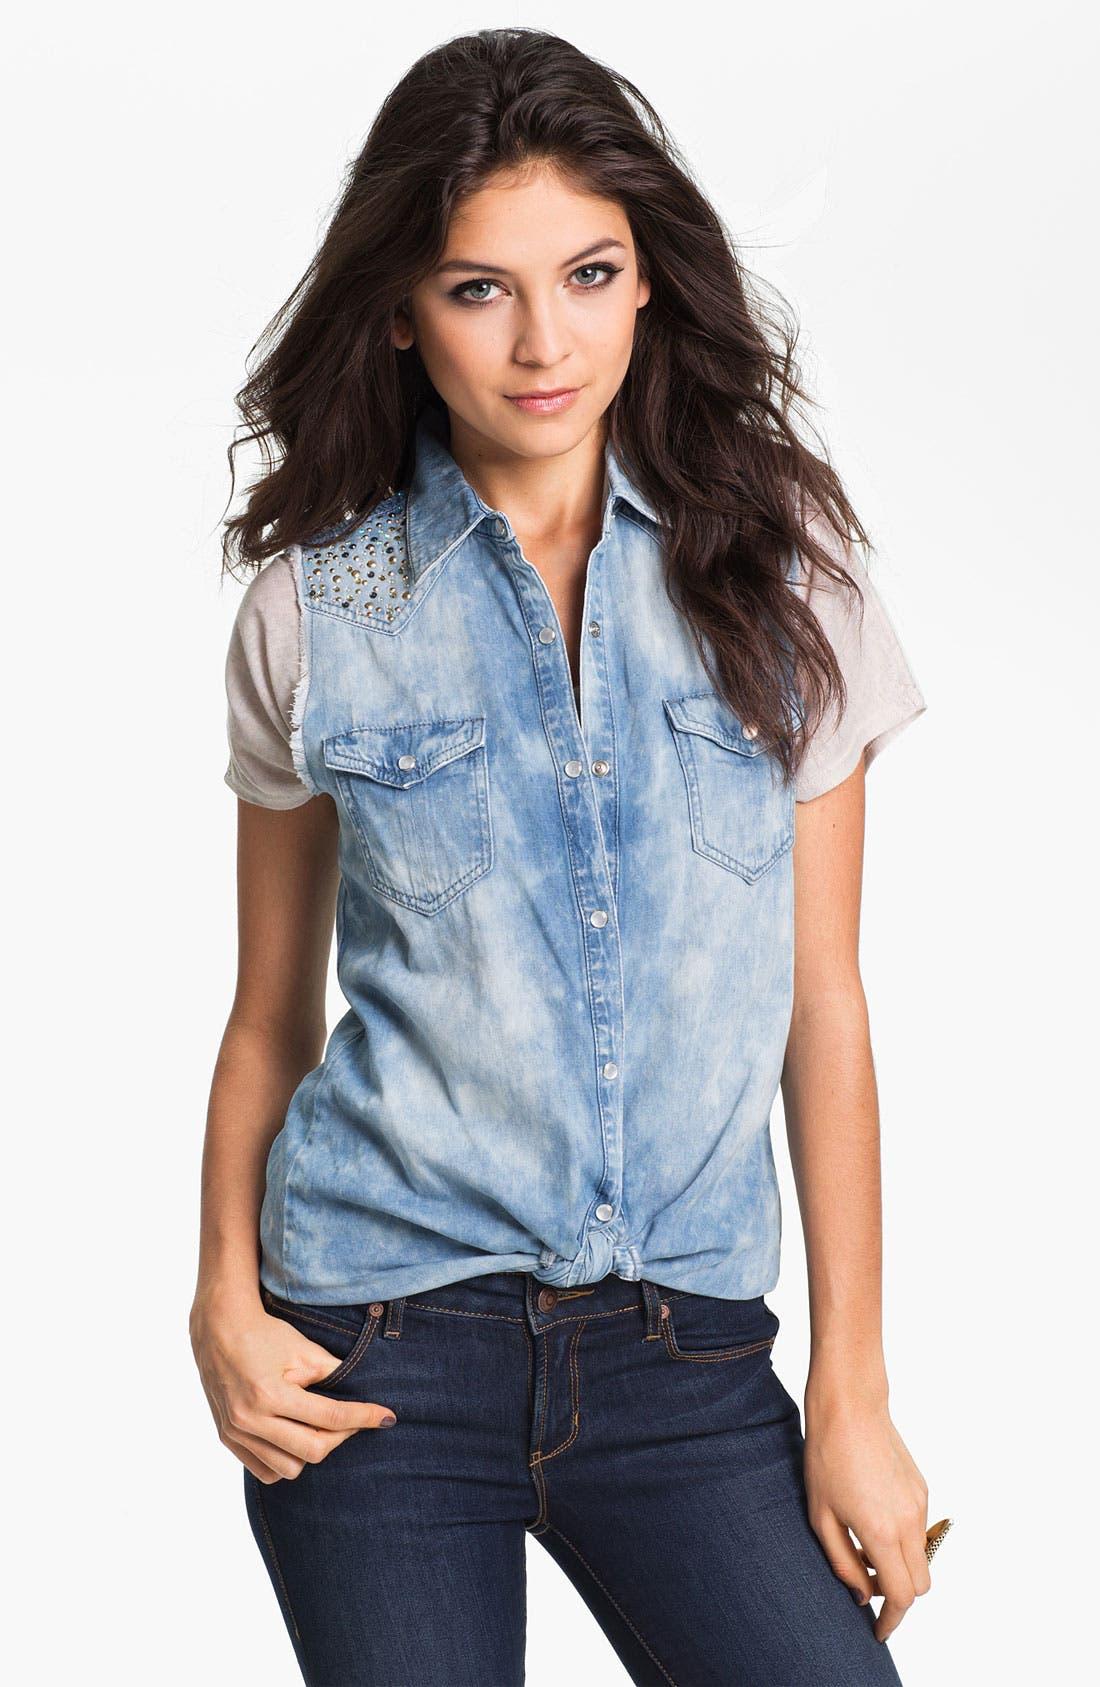 Alternate Image 1 Selected - Jolt Embellished Cutoff Chambray Shirt (Juniors)